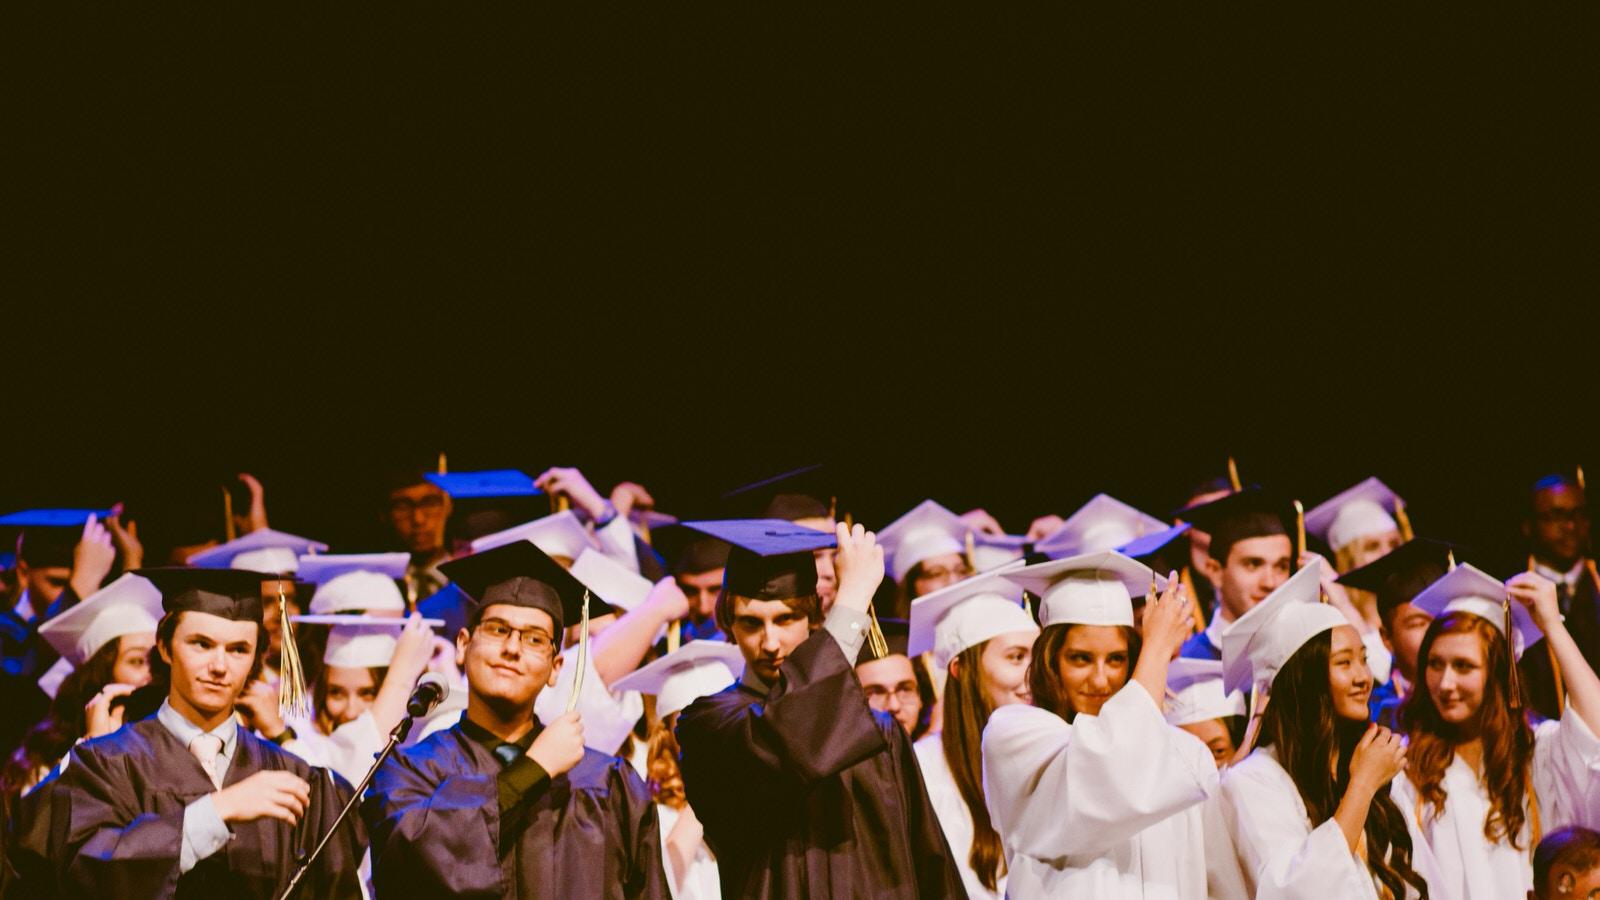 Graduation class photo